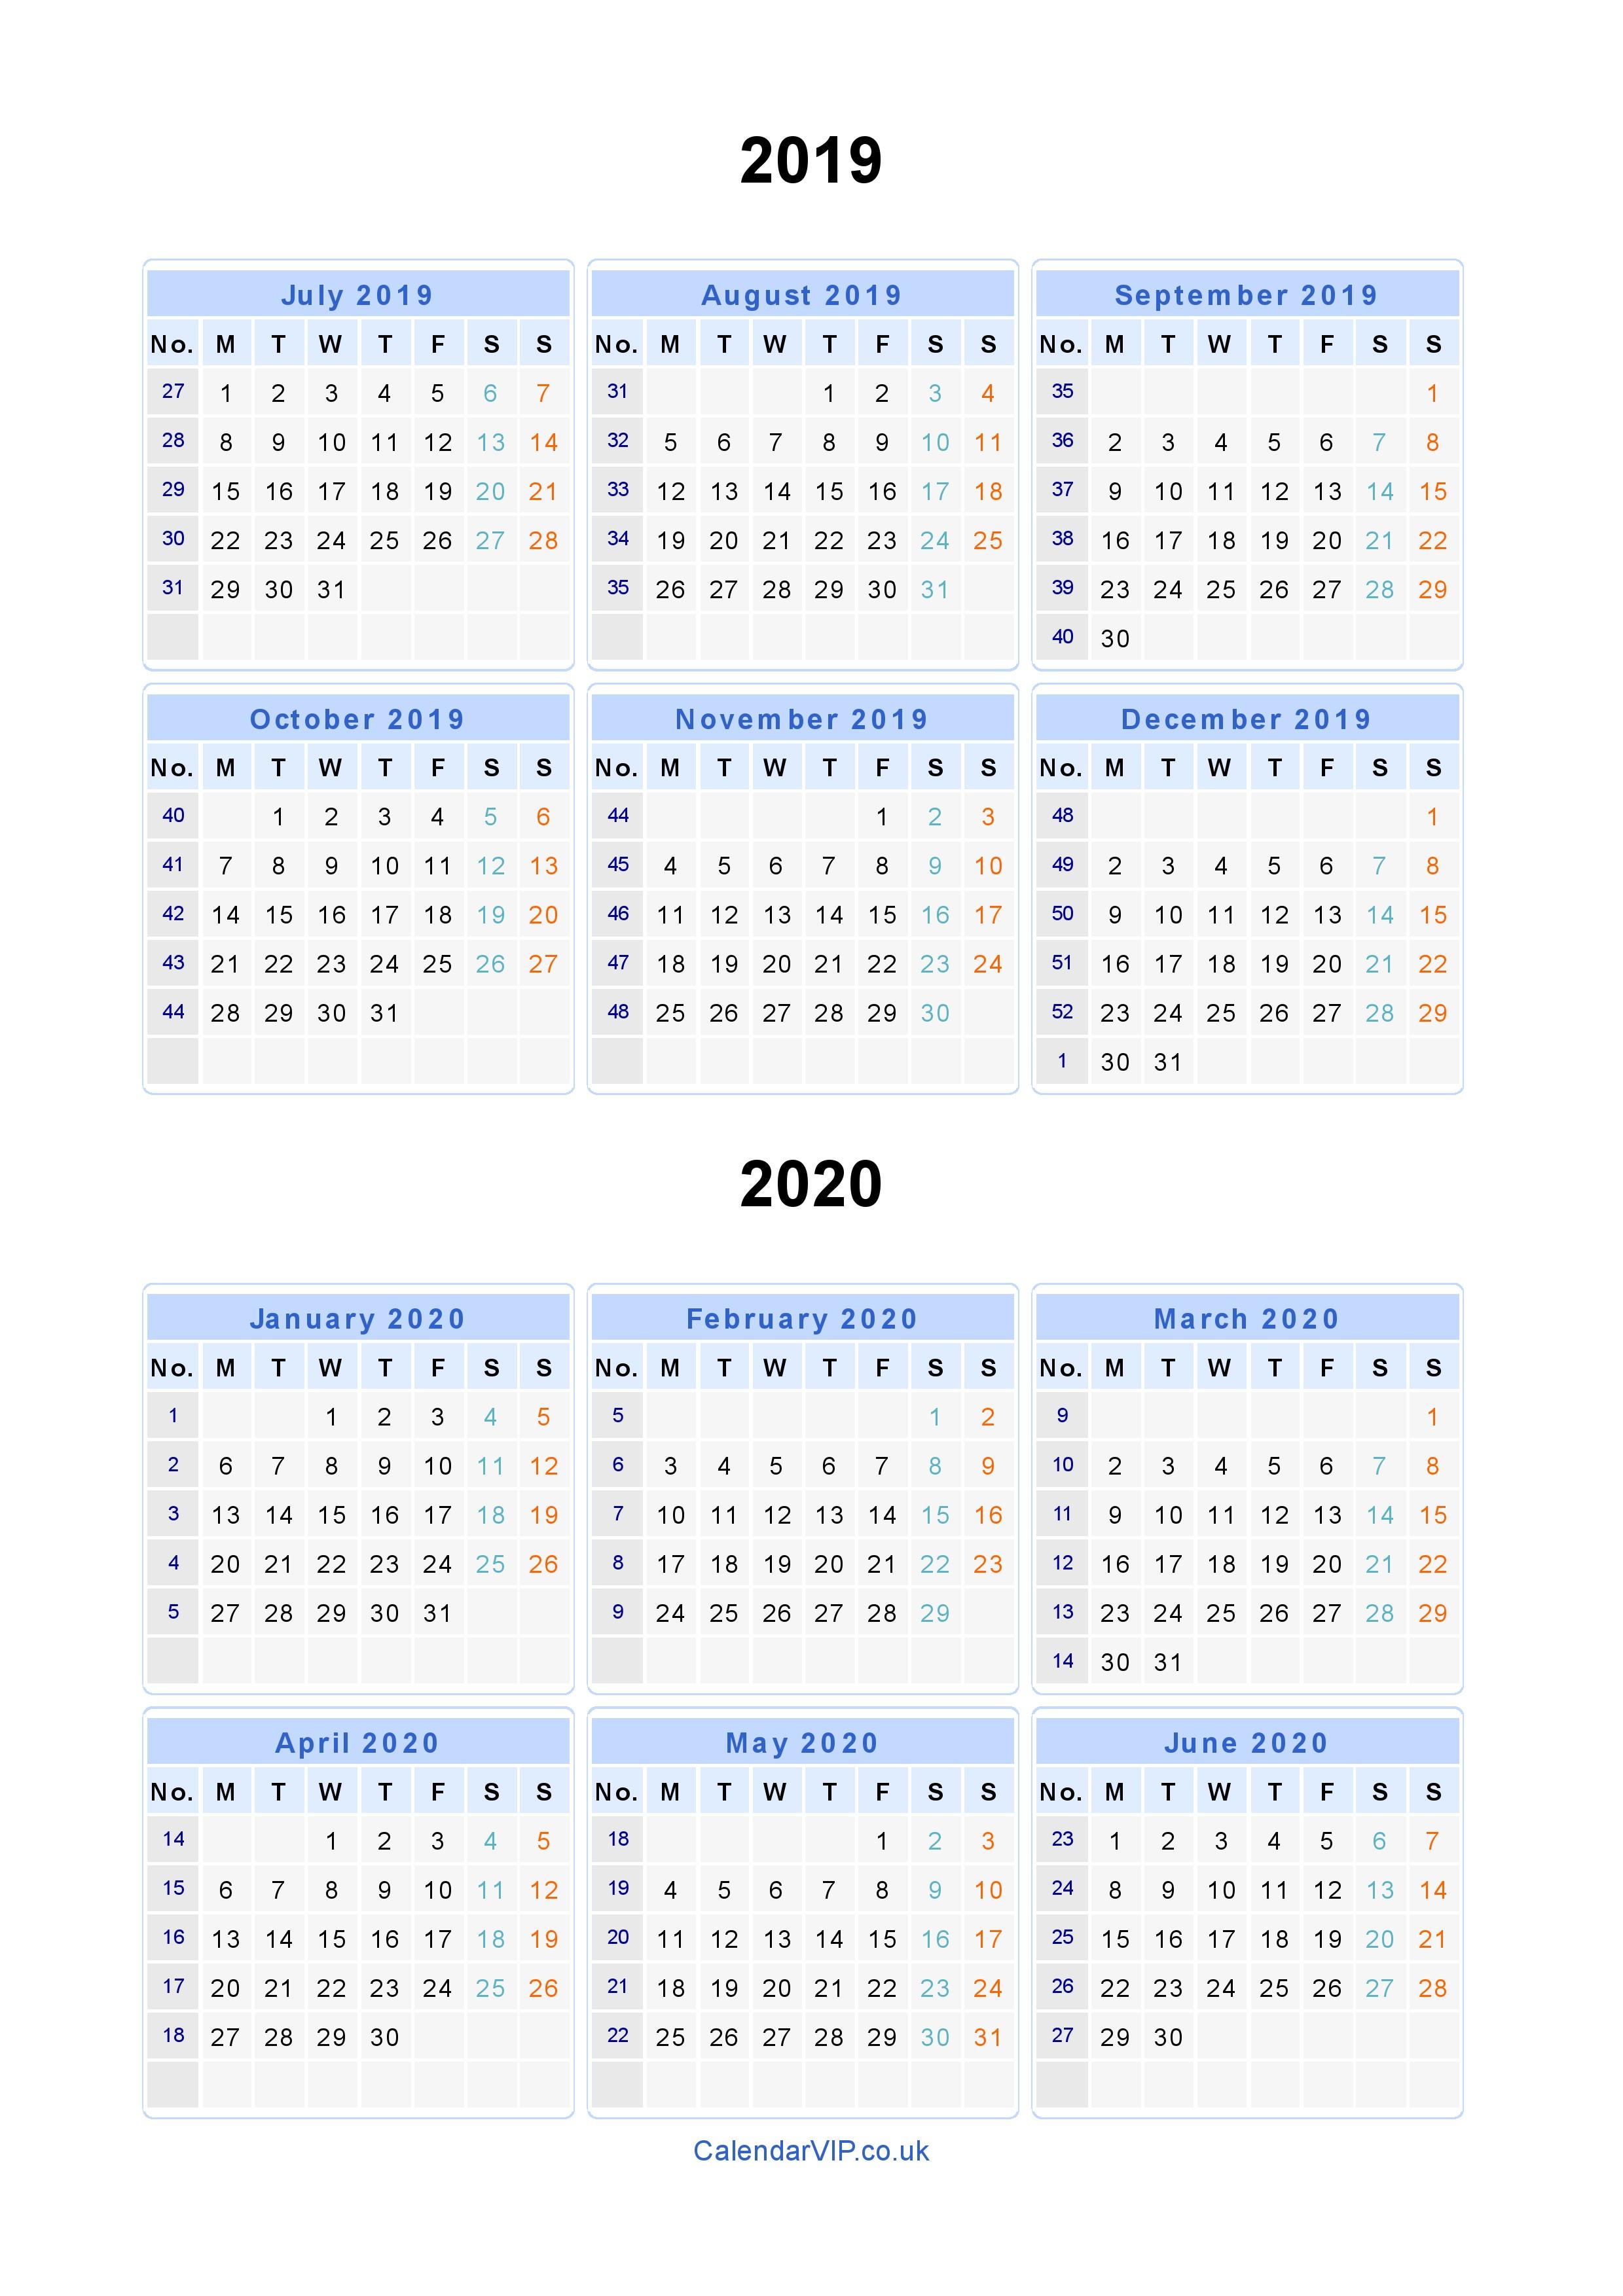 Split Year Calendars 2019 2020 - Calendar From July 2019 To June 2020 regarding Printable Year At A Glance Calendar 2019-2020